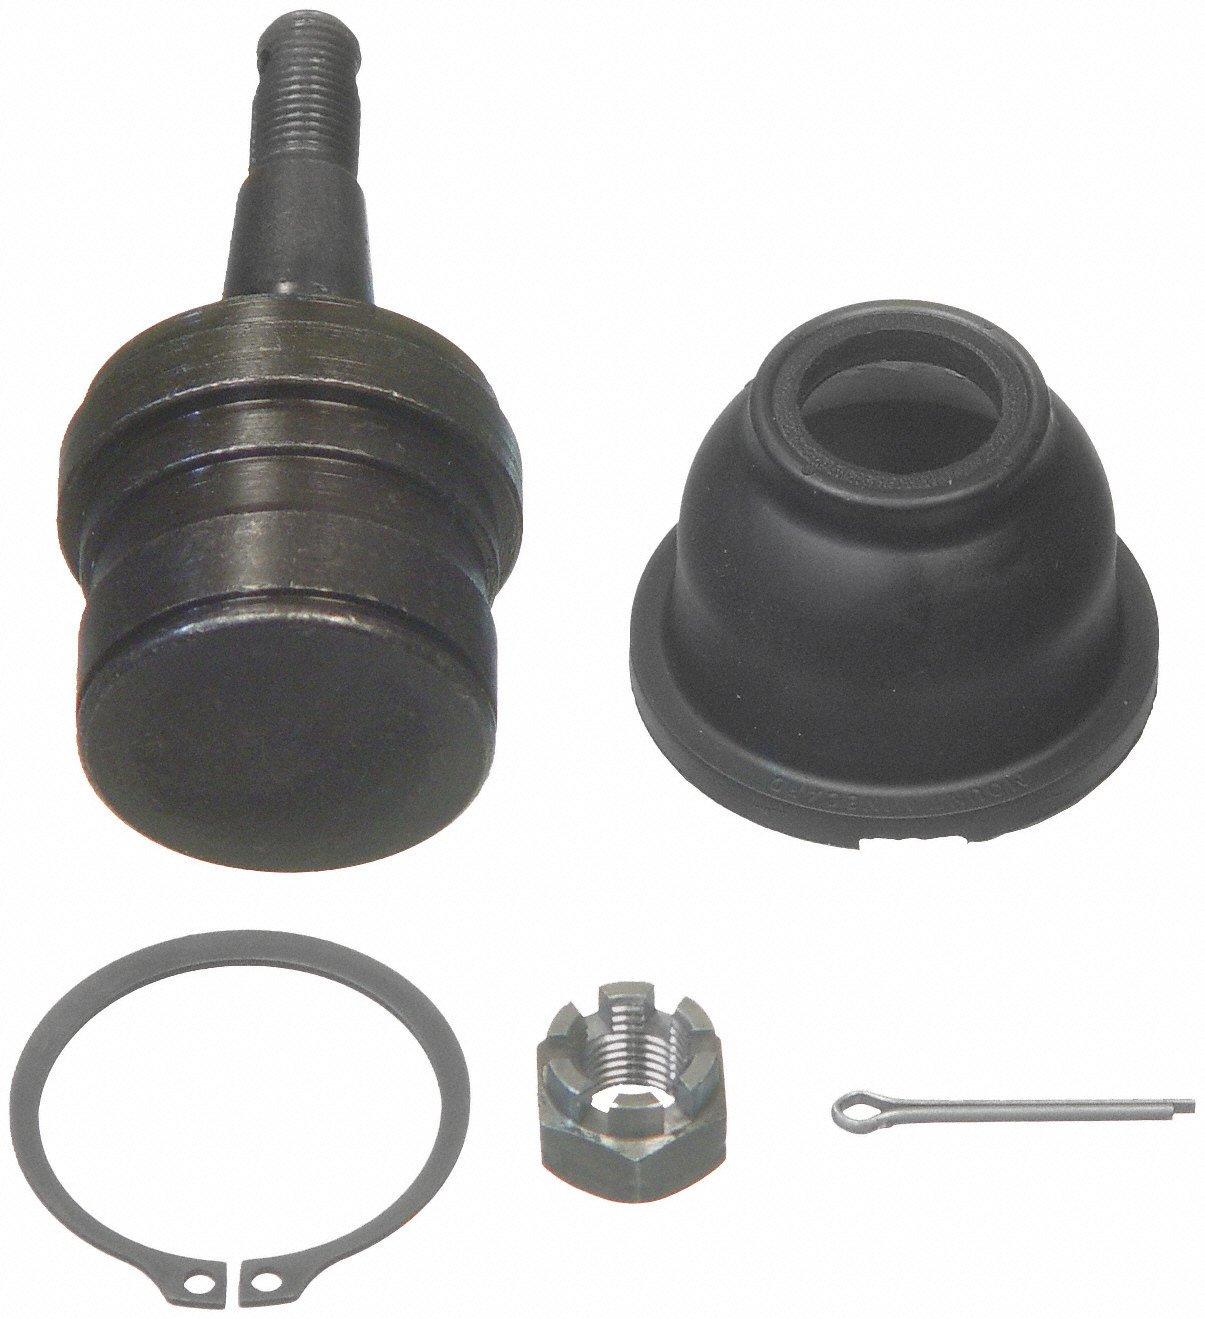 DLZ 4 Pcs Front Suspension Kit-2 Lower 2 Upper Ball Joint Compatible with 1997 1998 1999 Dodge Dakota 4WD 1998 1999 Dodge Durango 4WD K7242 K7267